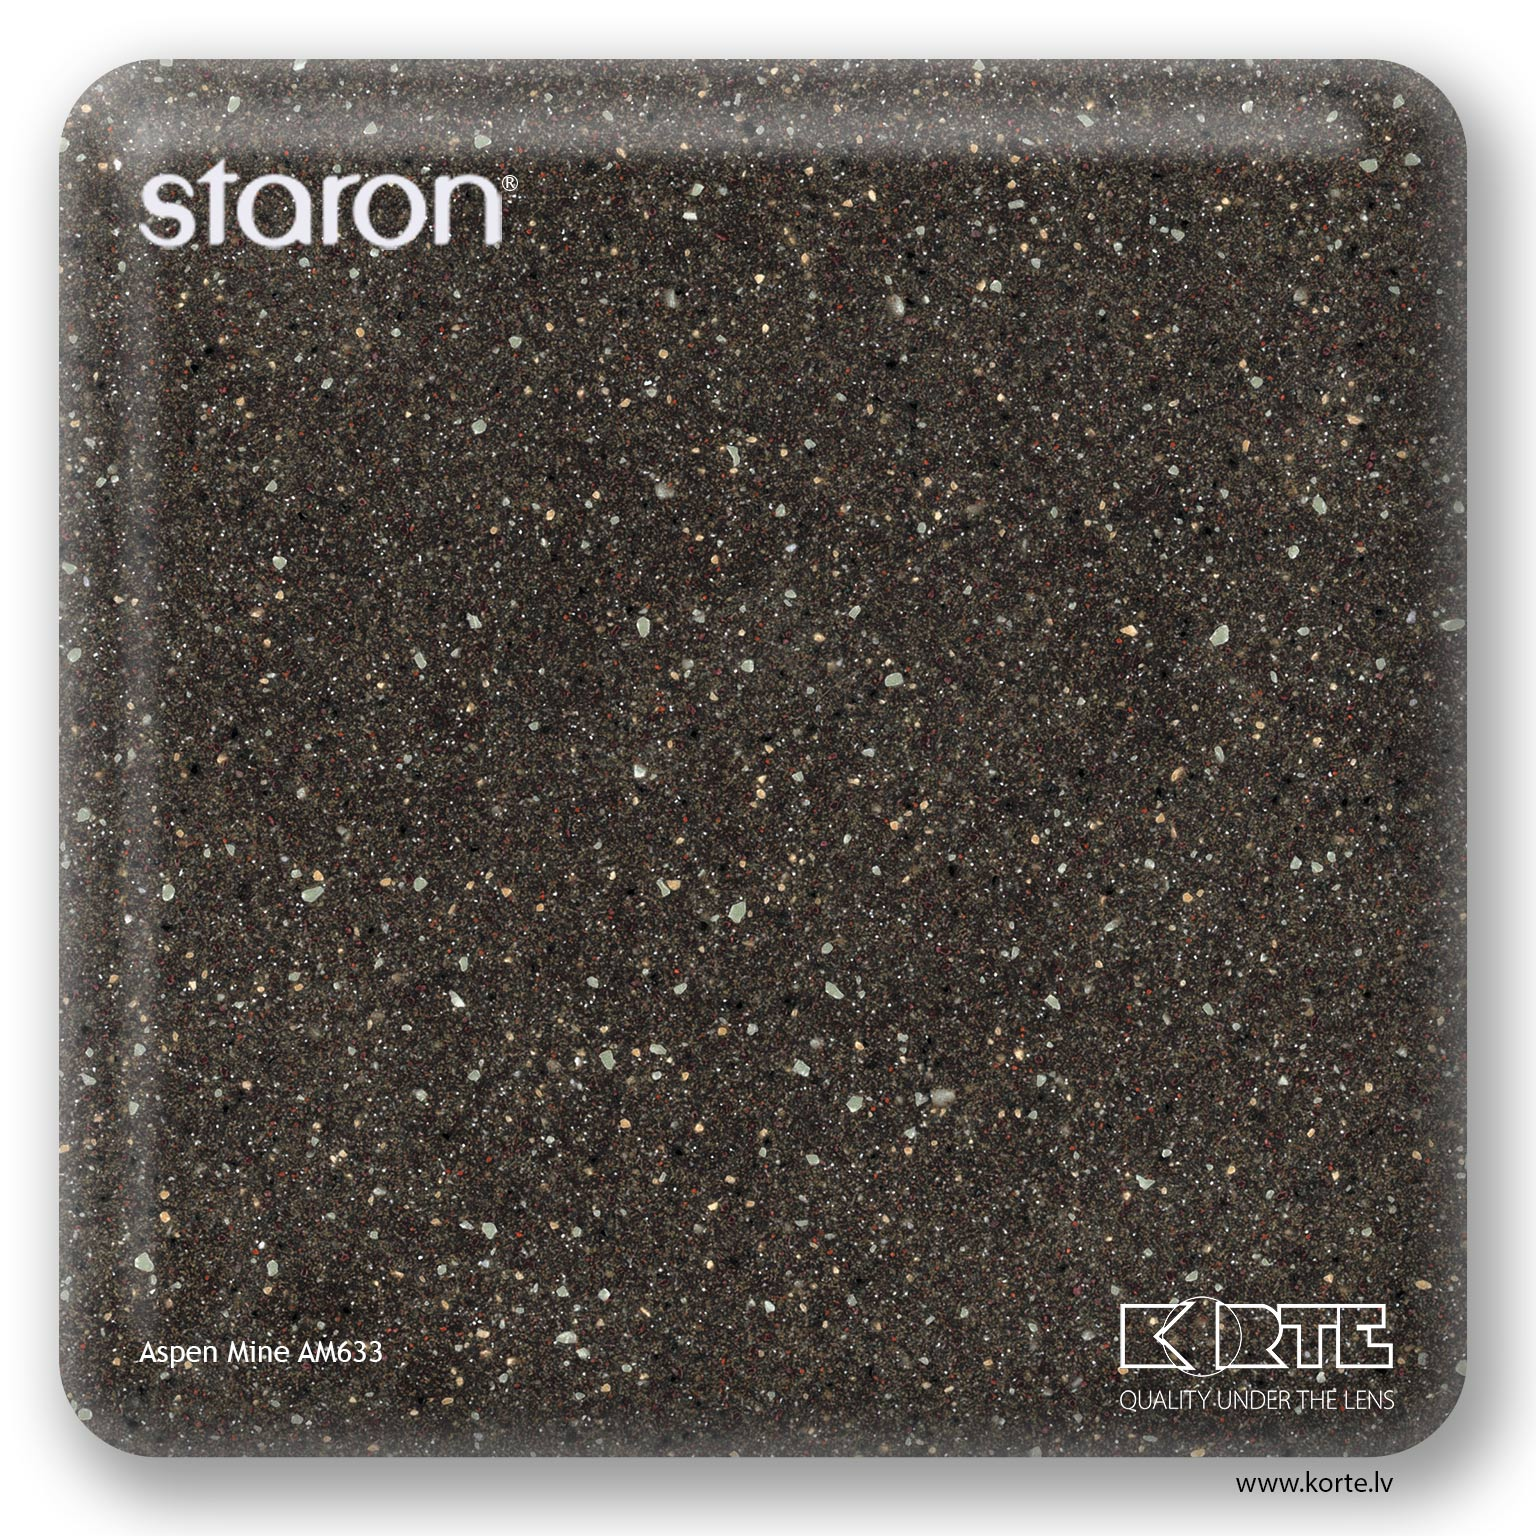 Staron Aspen Mine AM633